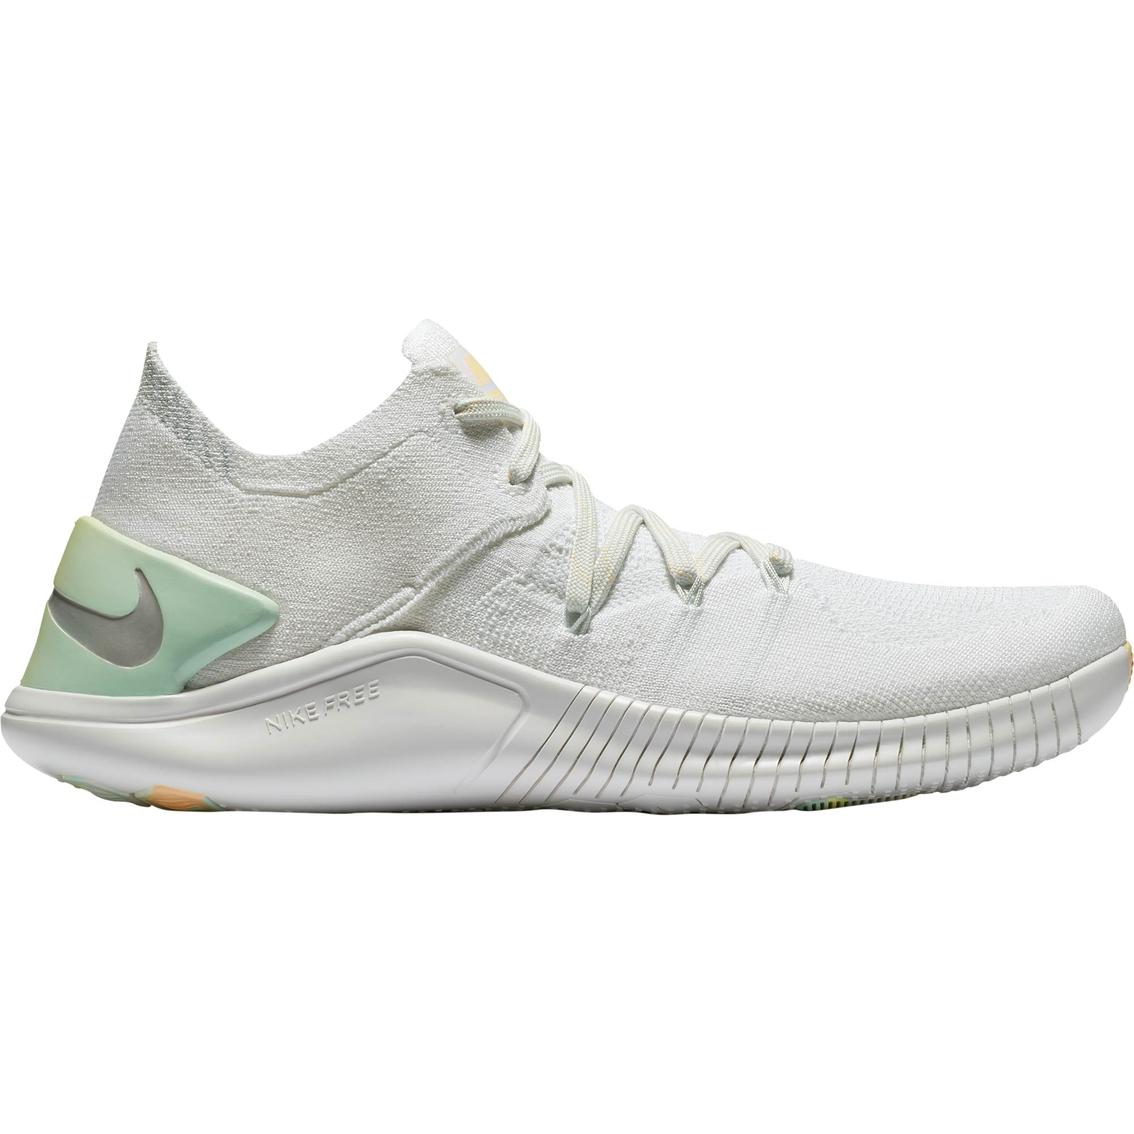 9dfdd11230dad7 Nike Women s Free Tr Flyknit 3 Rise Training Shoes